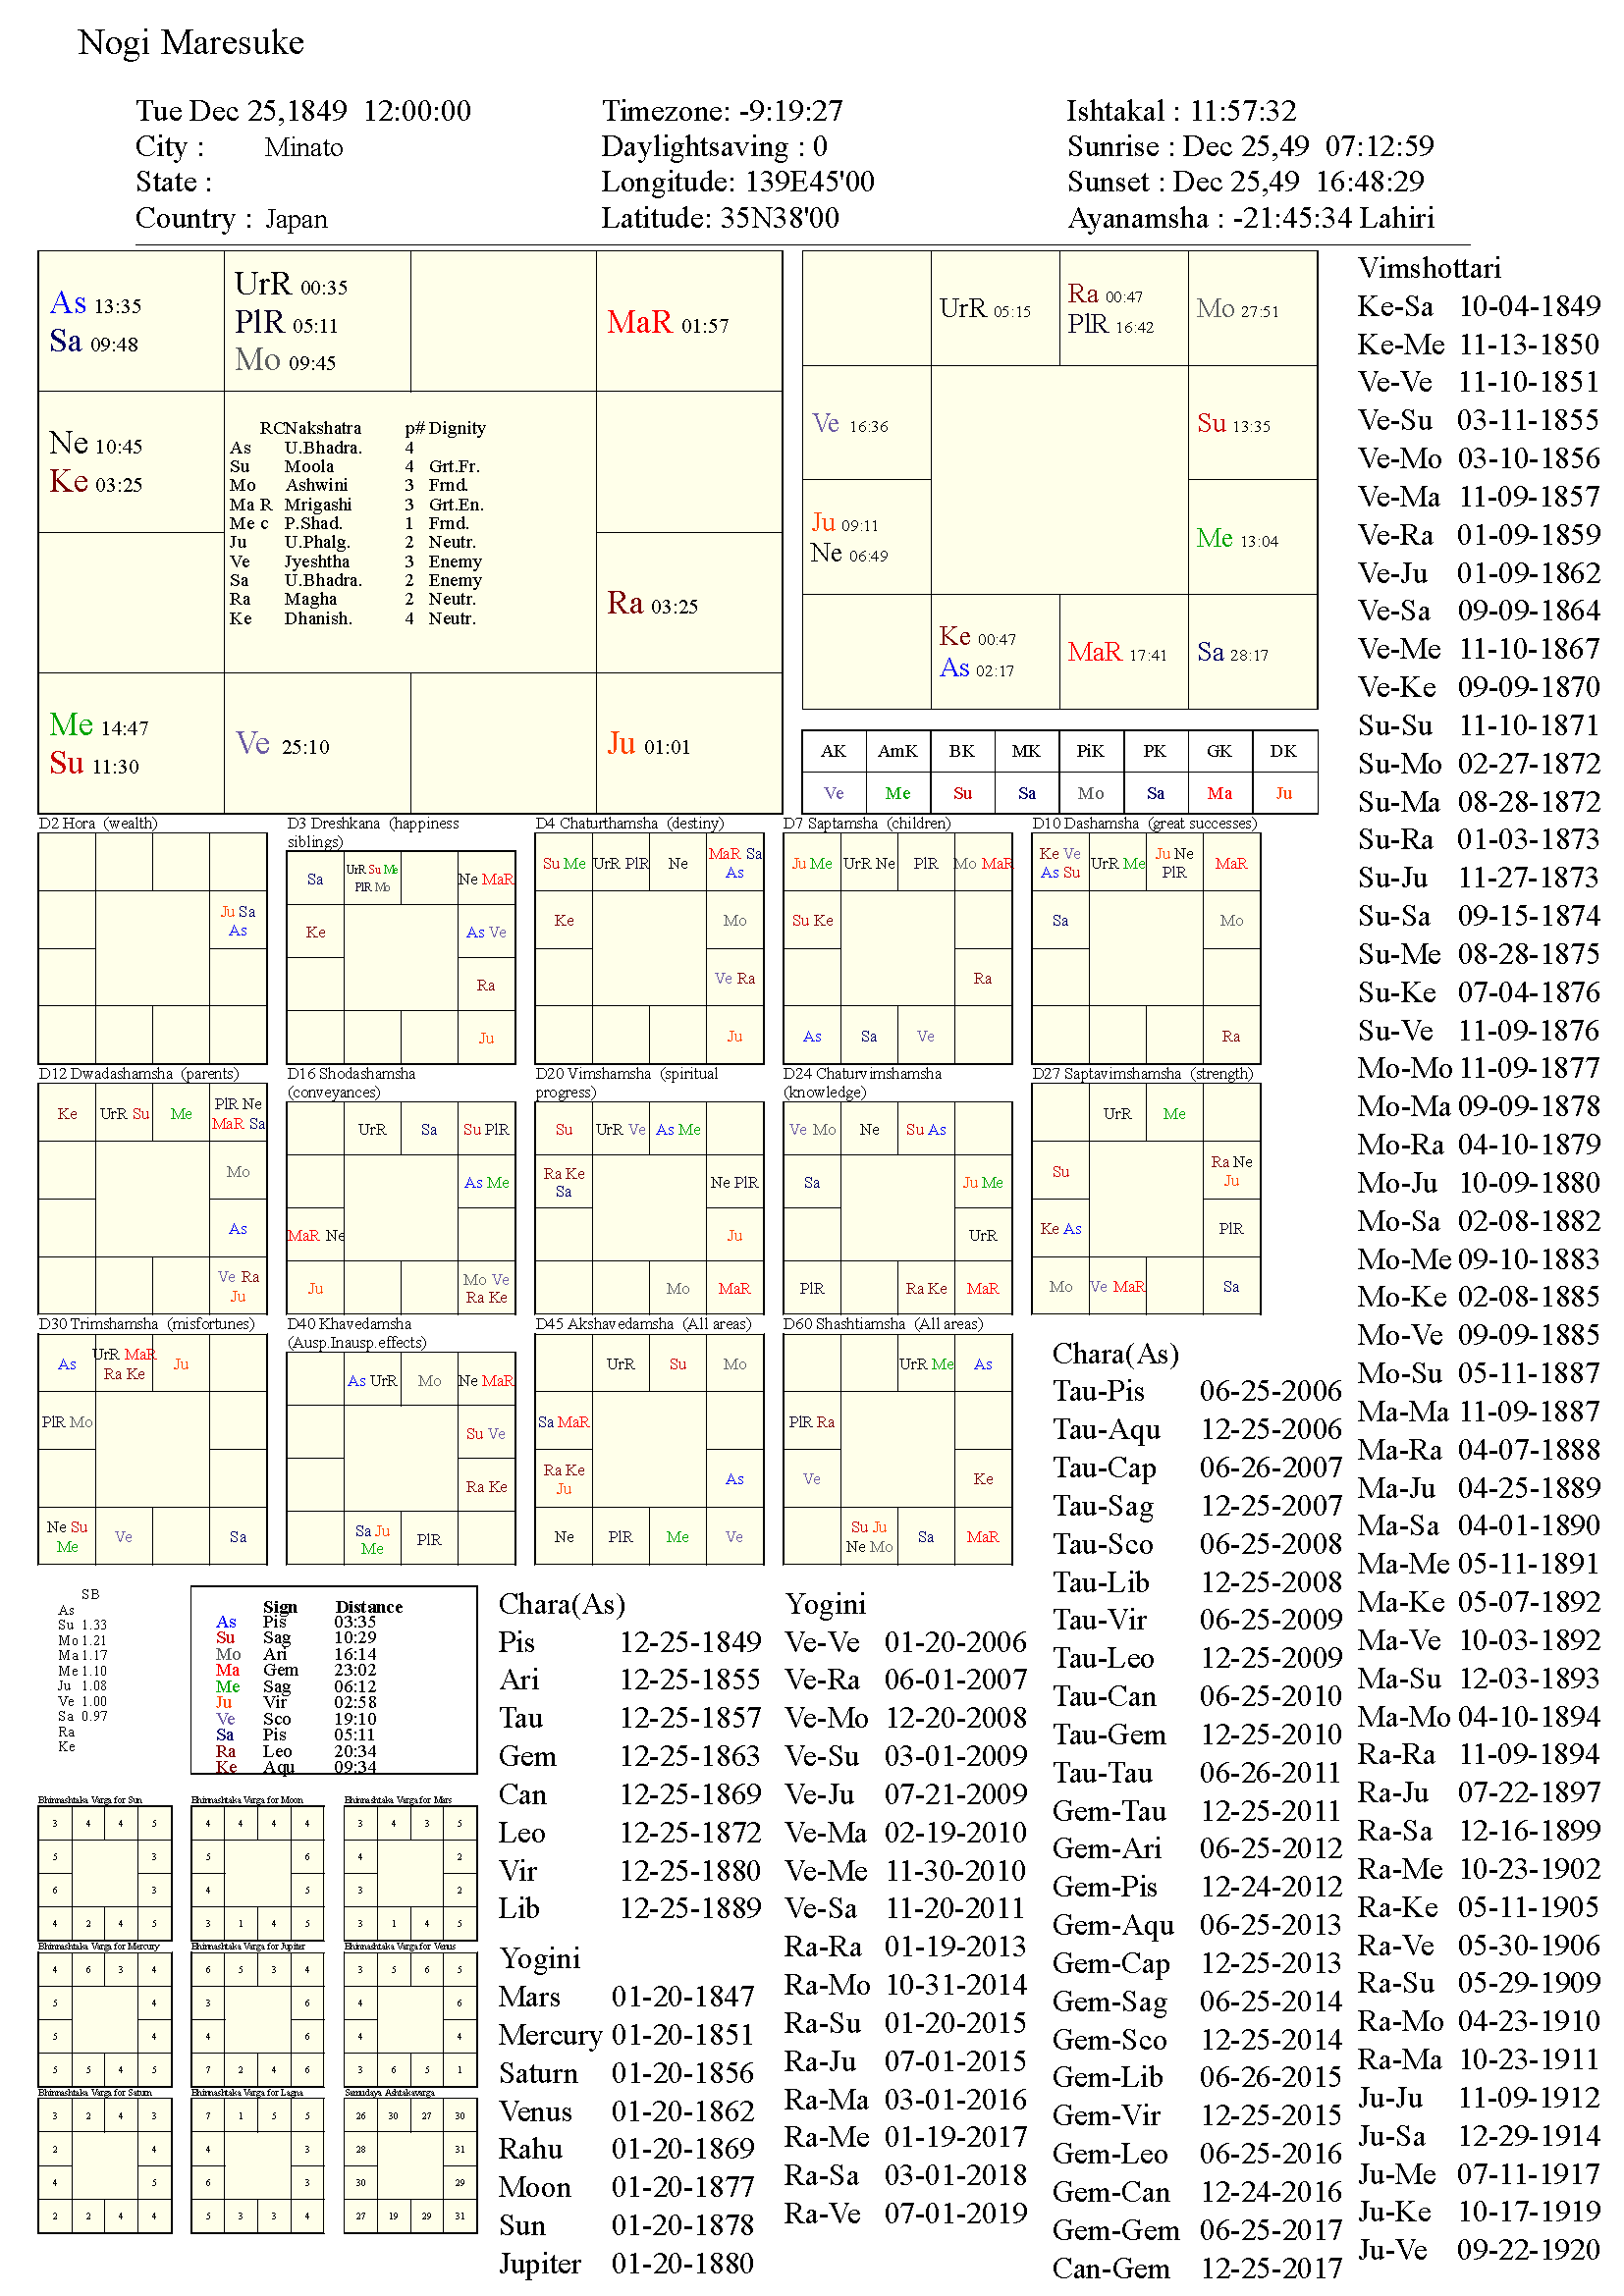 nogimaresuke_chart